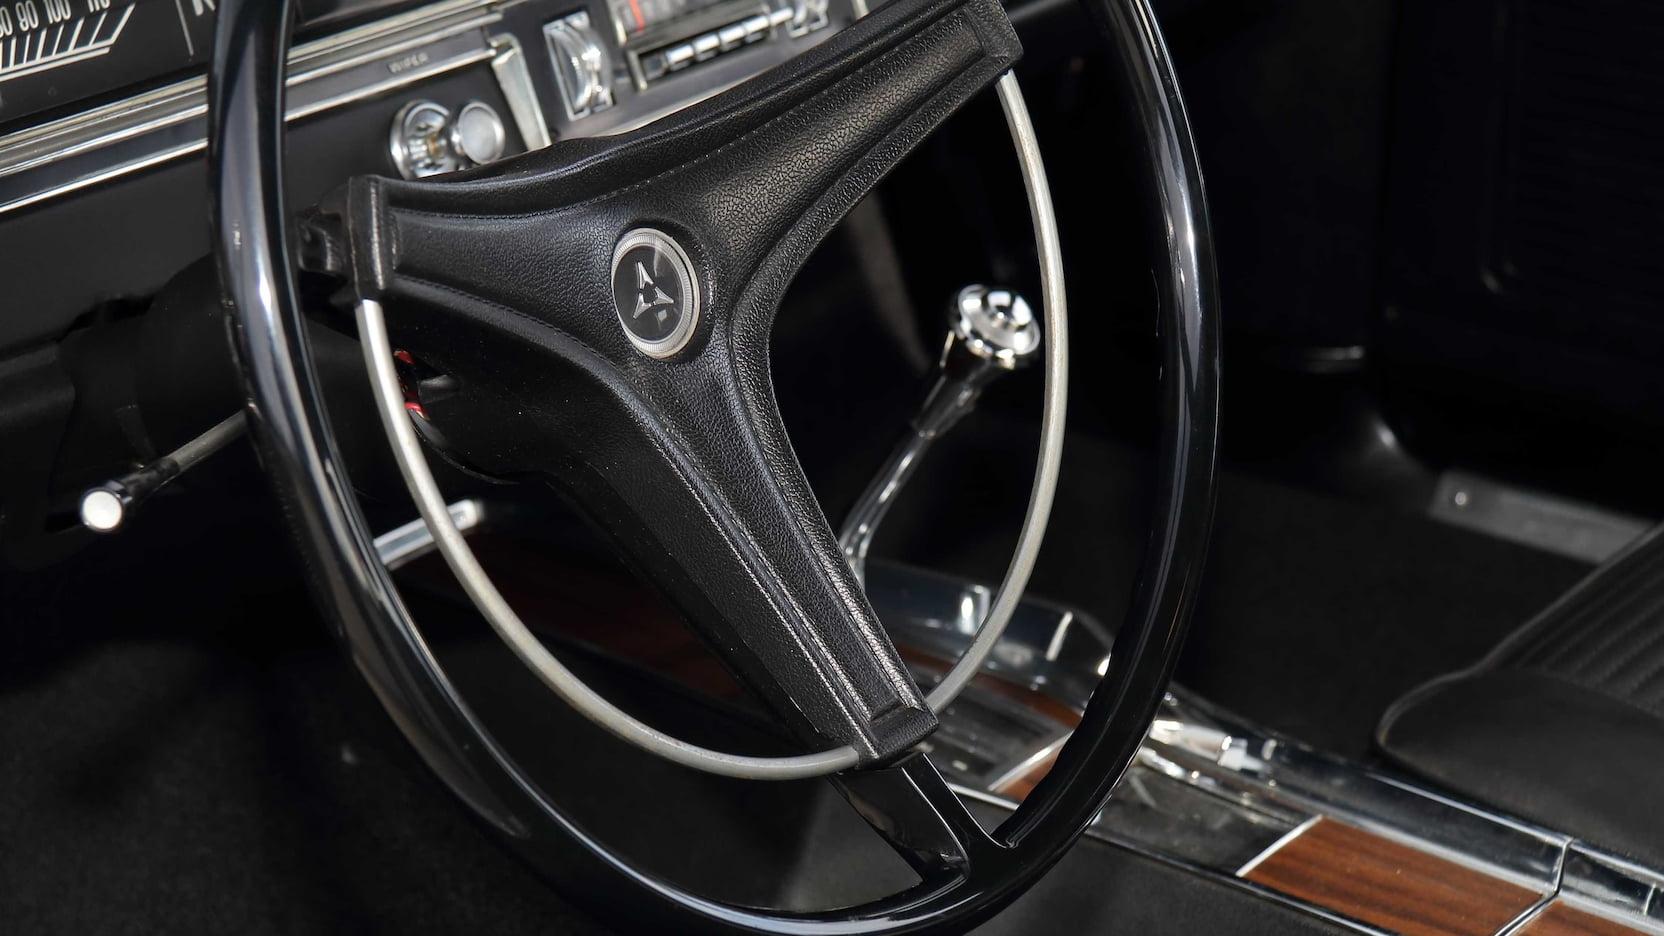 1969 Dodge Dart GTS Interior Steering Wheel